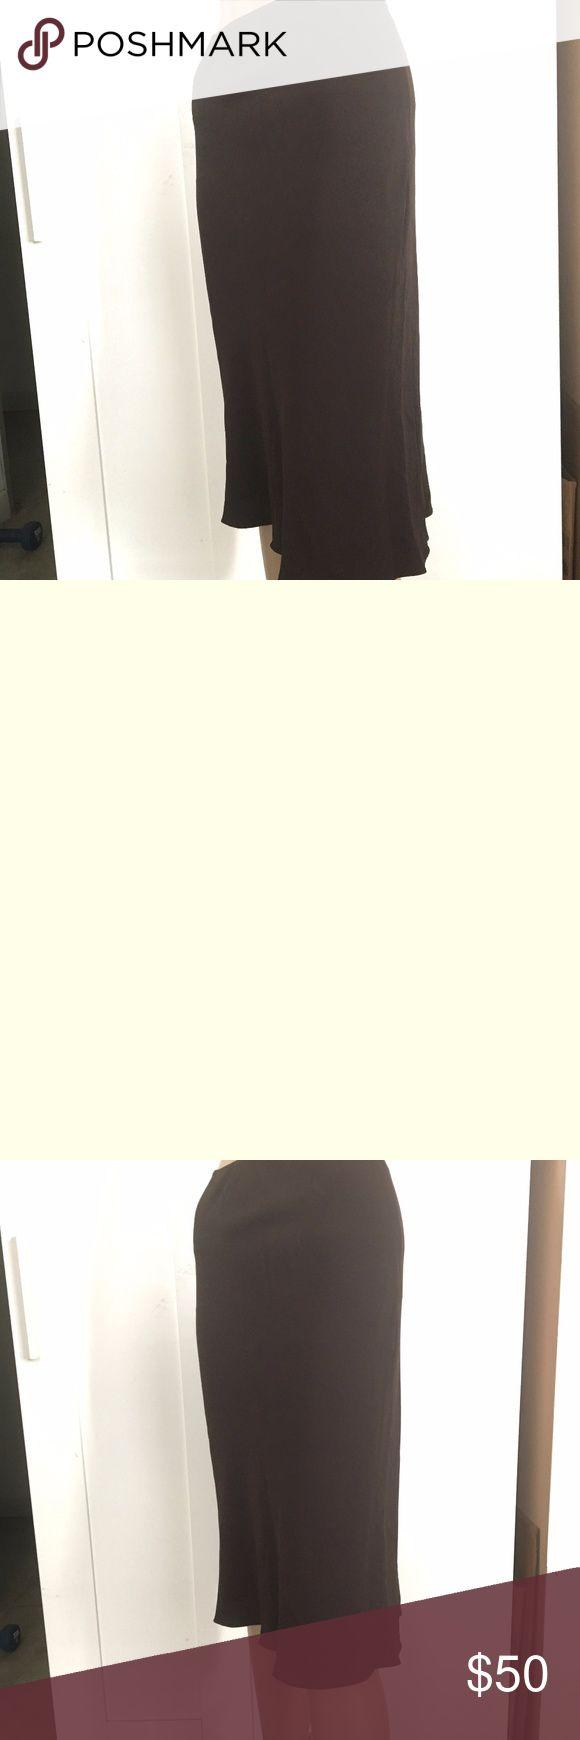 AUTHENTIC PRADA BROWN SILK TULIP CUT SKIRT 2 AUTHENTIC GORGEOUS PRADA COLLECTION BROWN SILK TULIP CUT SKIRT IN A SIZE 2. Prada Skirts Midi